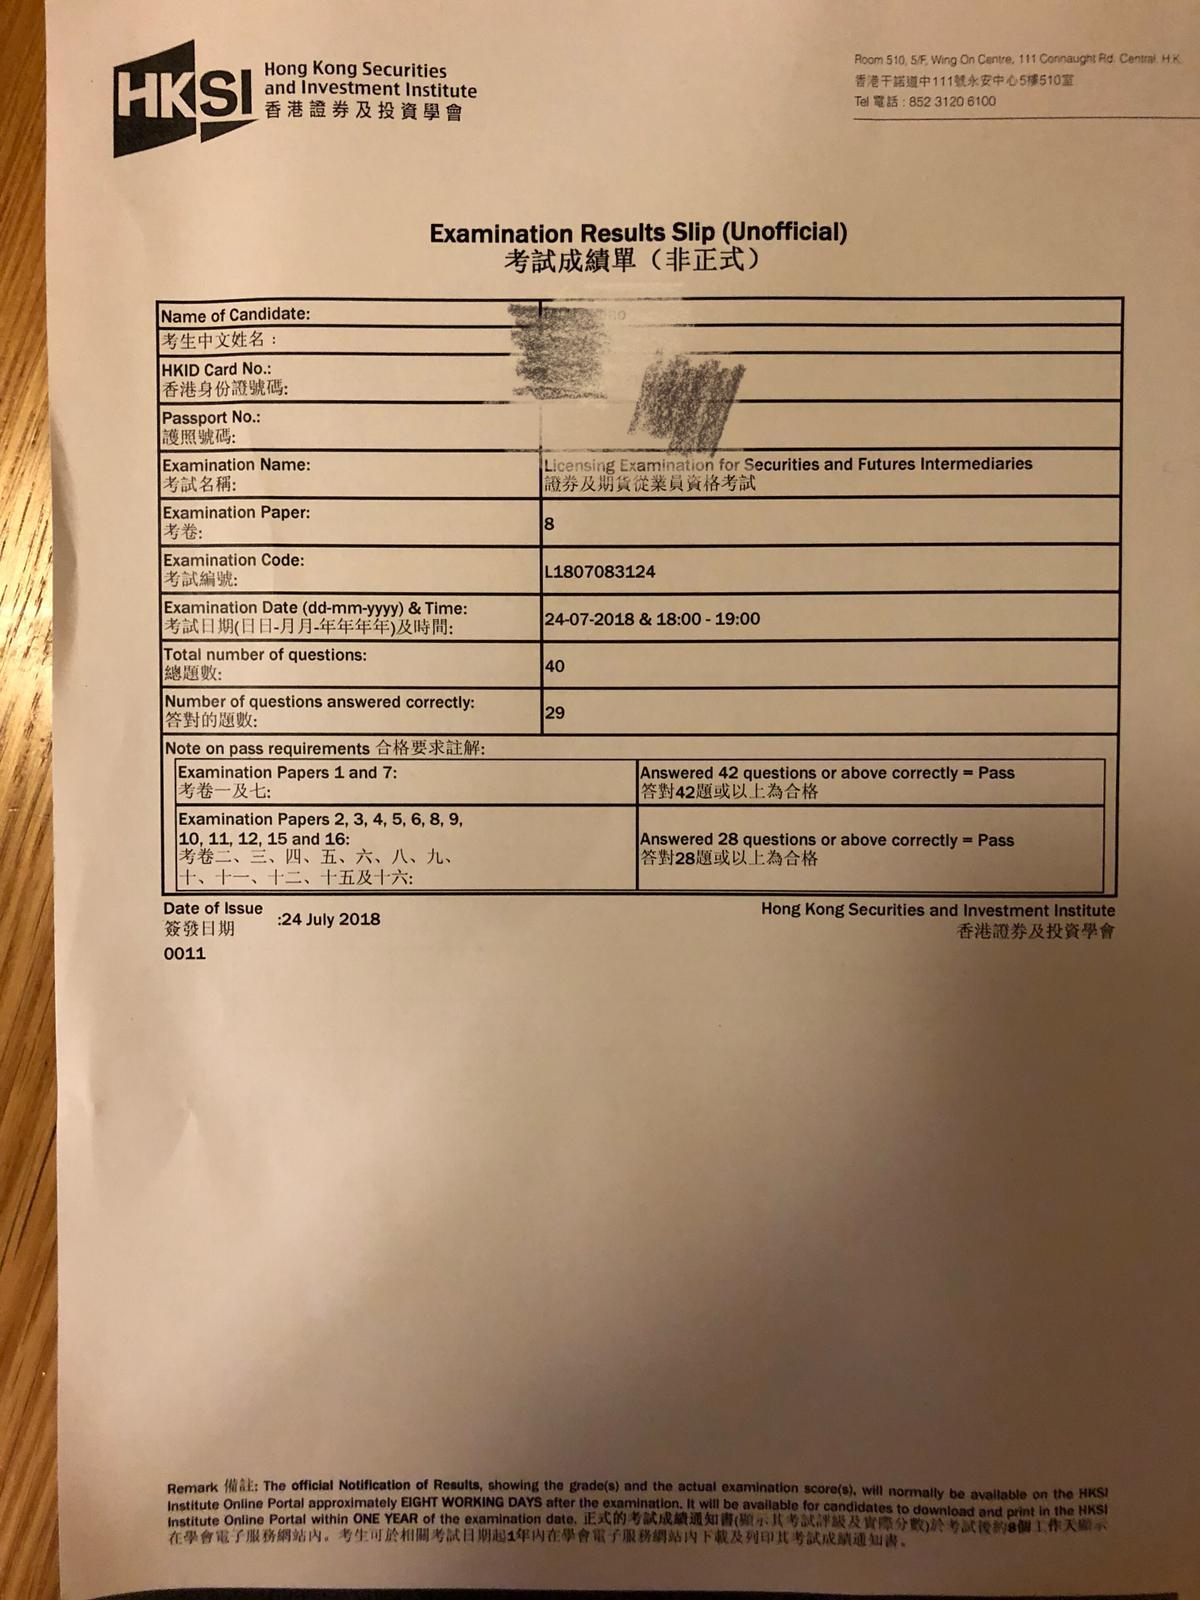 MML 24/7/2018 LE Paper 8 證券期貨從業員資格考試卷八 Pass